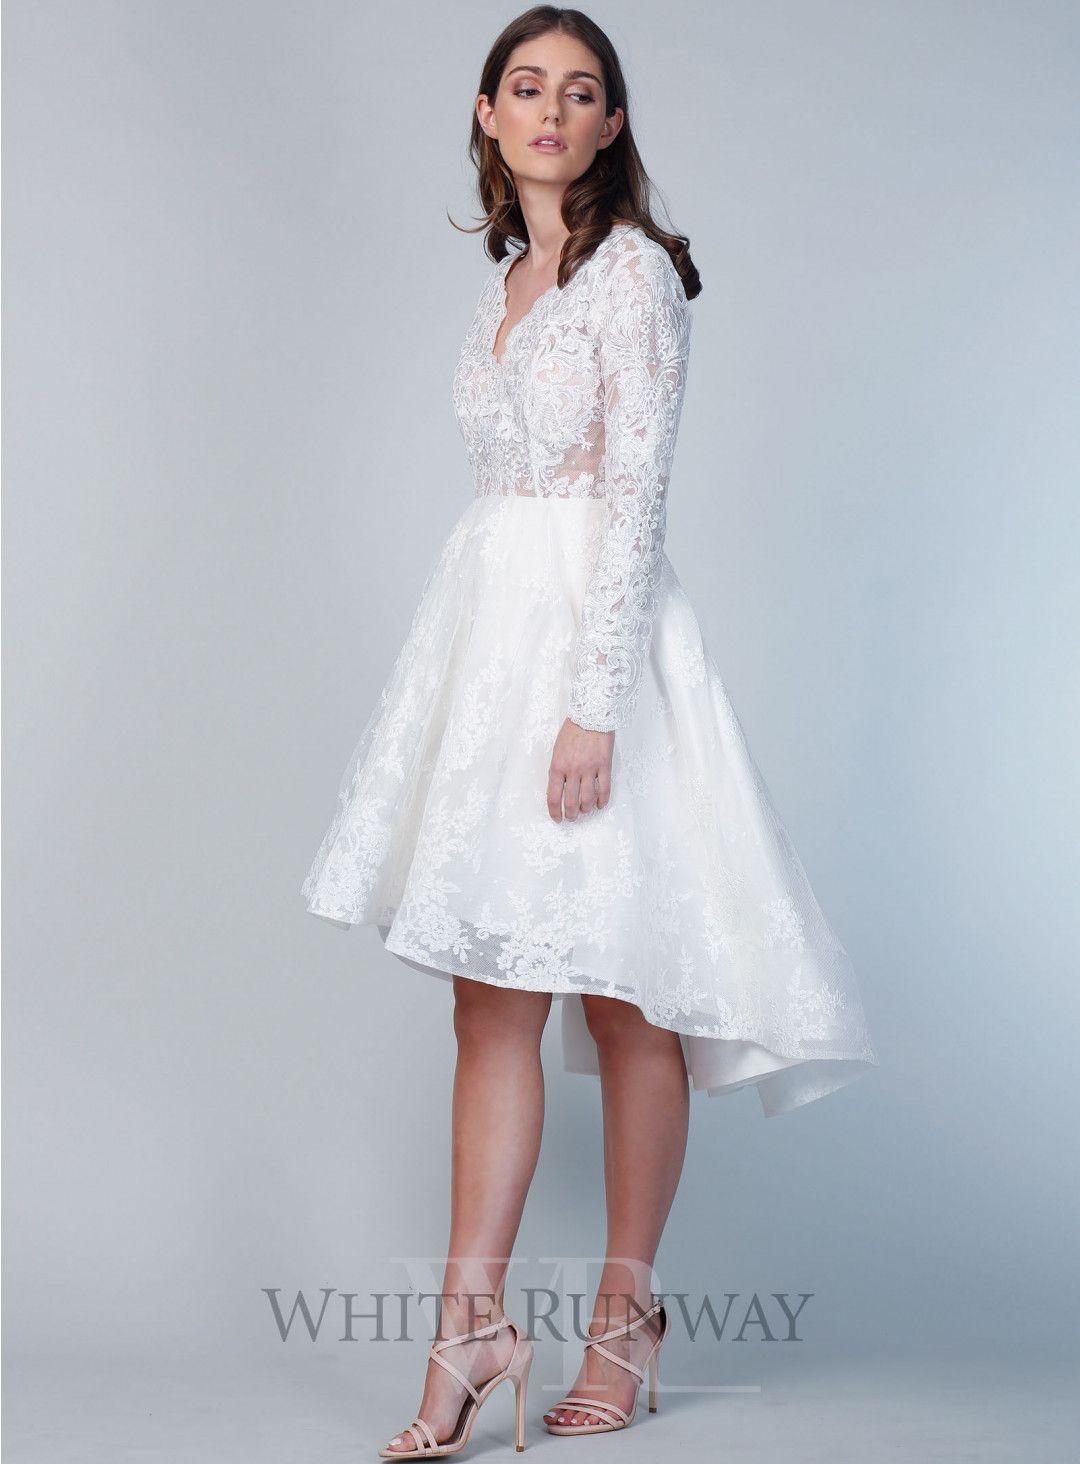 Cocktail dresses for summer wedding  Emi Lace Cocktail Dress  Bridal Gowns CocktailTeaLengthMidi